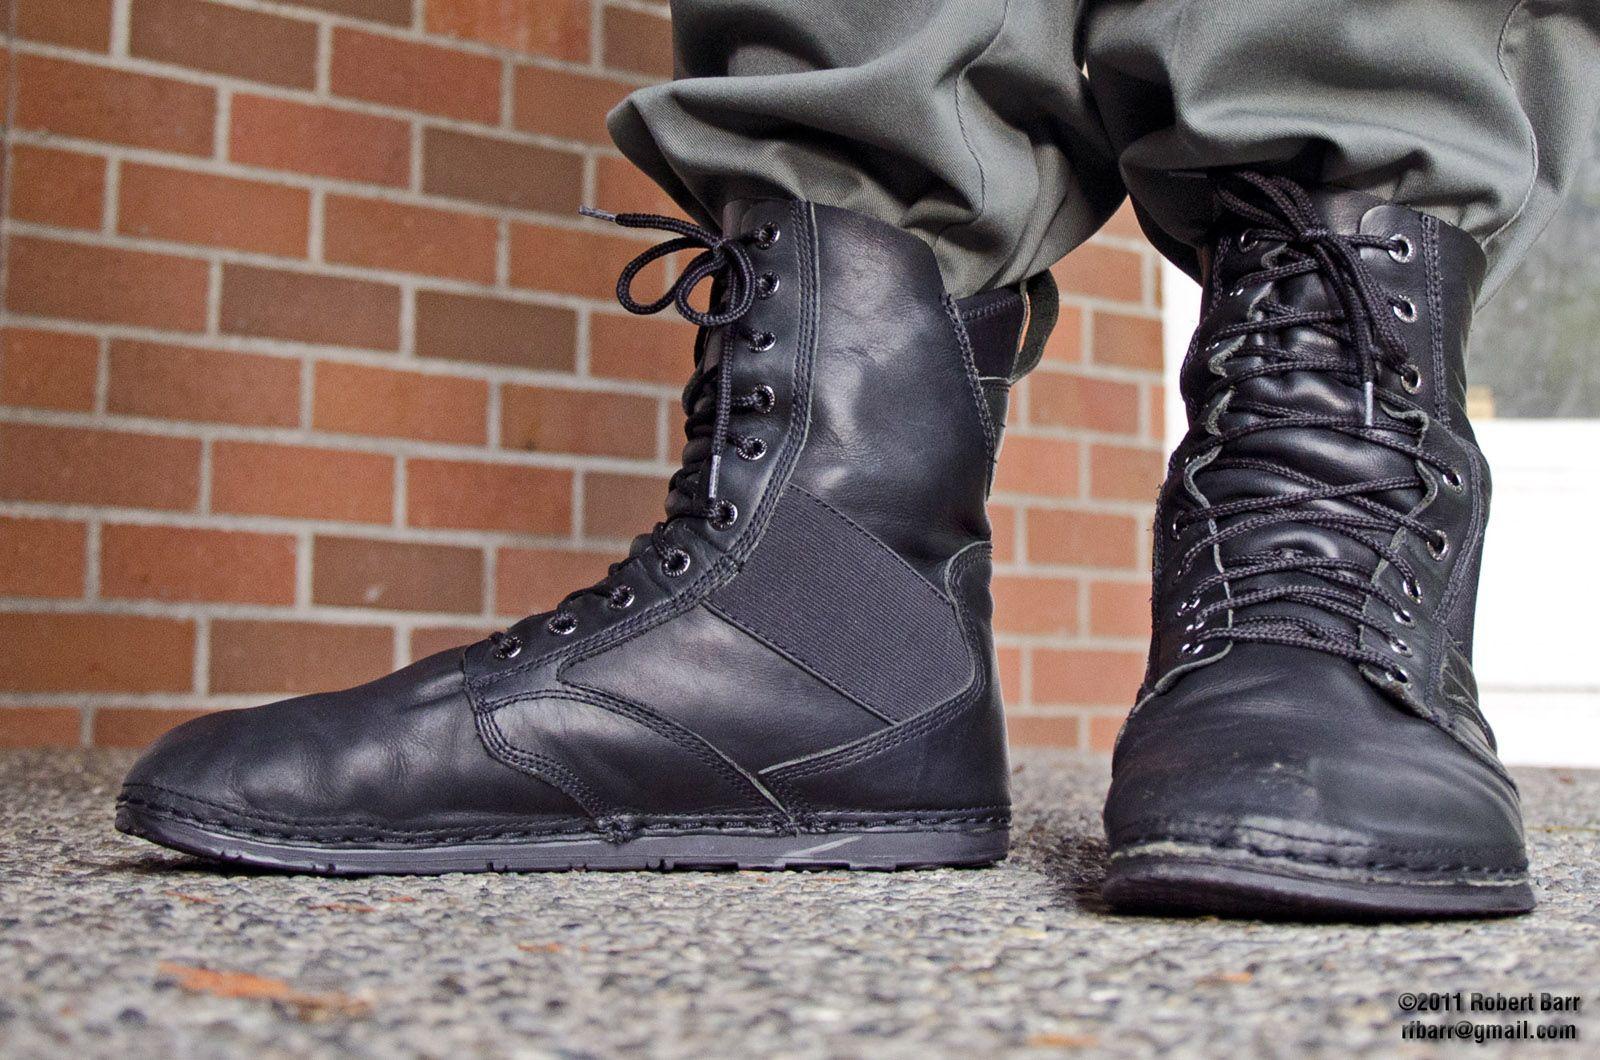 8479183291b2 Oetzi3300 Troop Boot Review primal   paleo winter shoes!